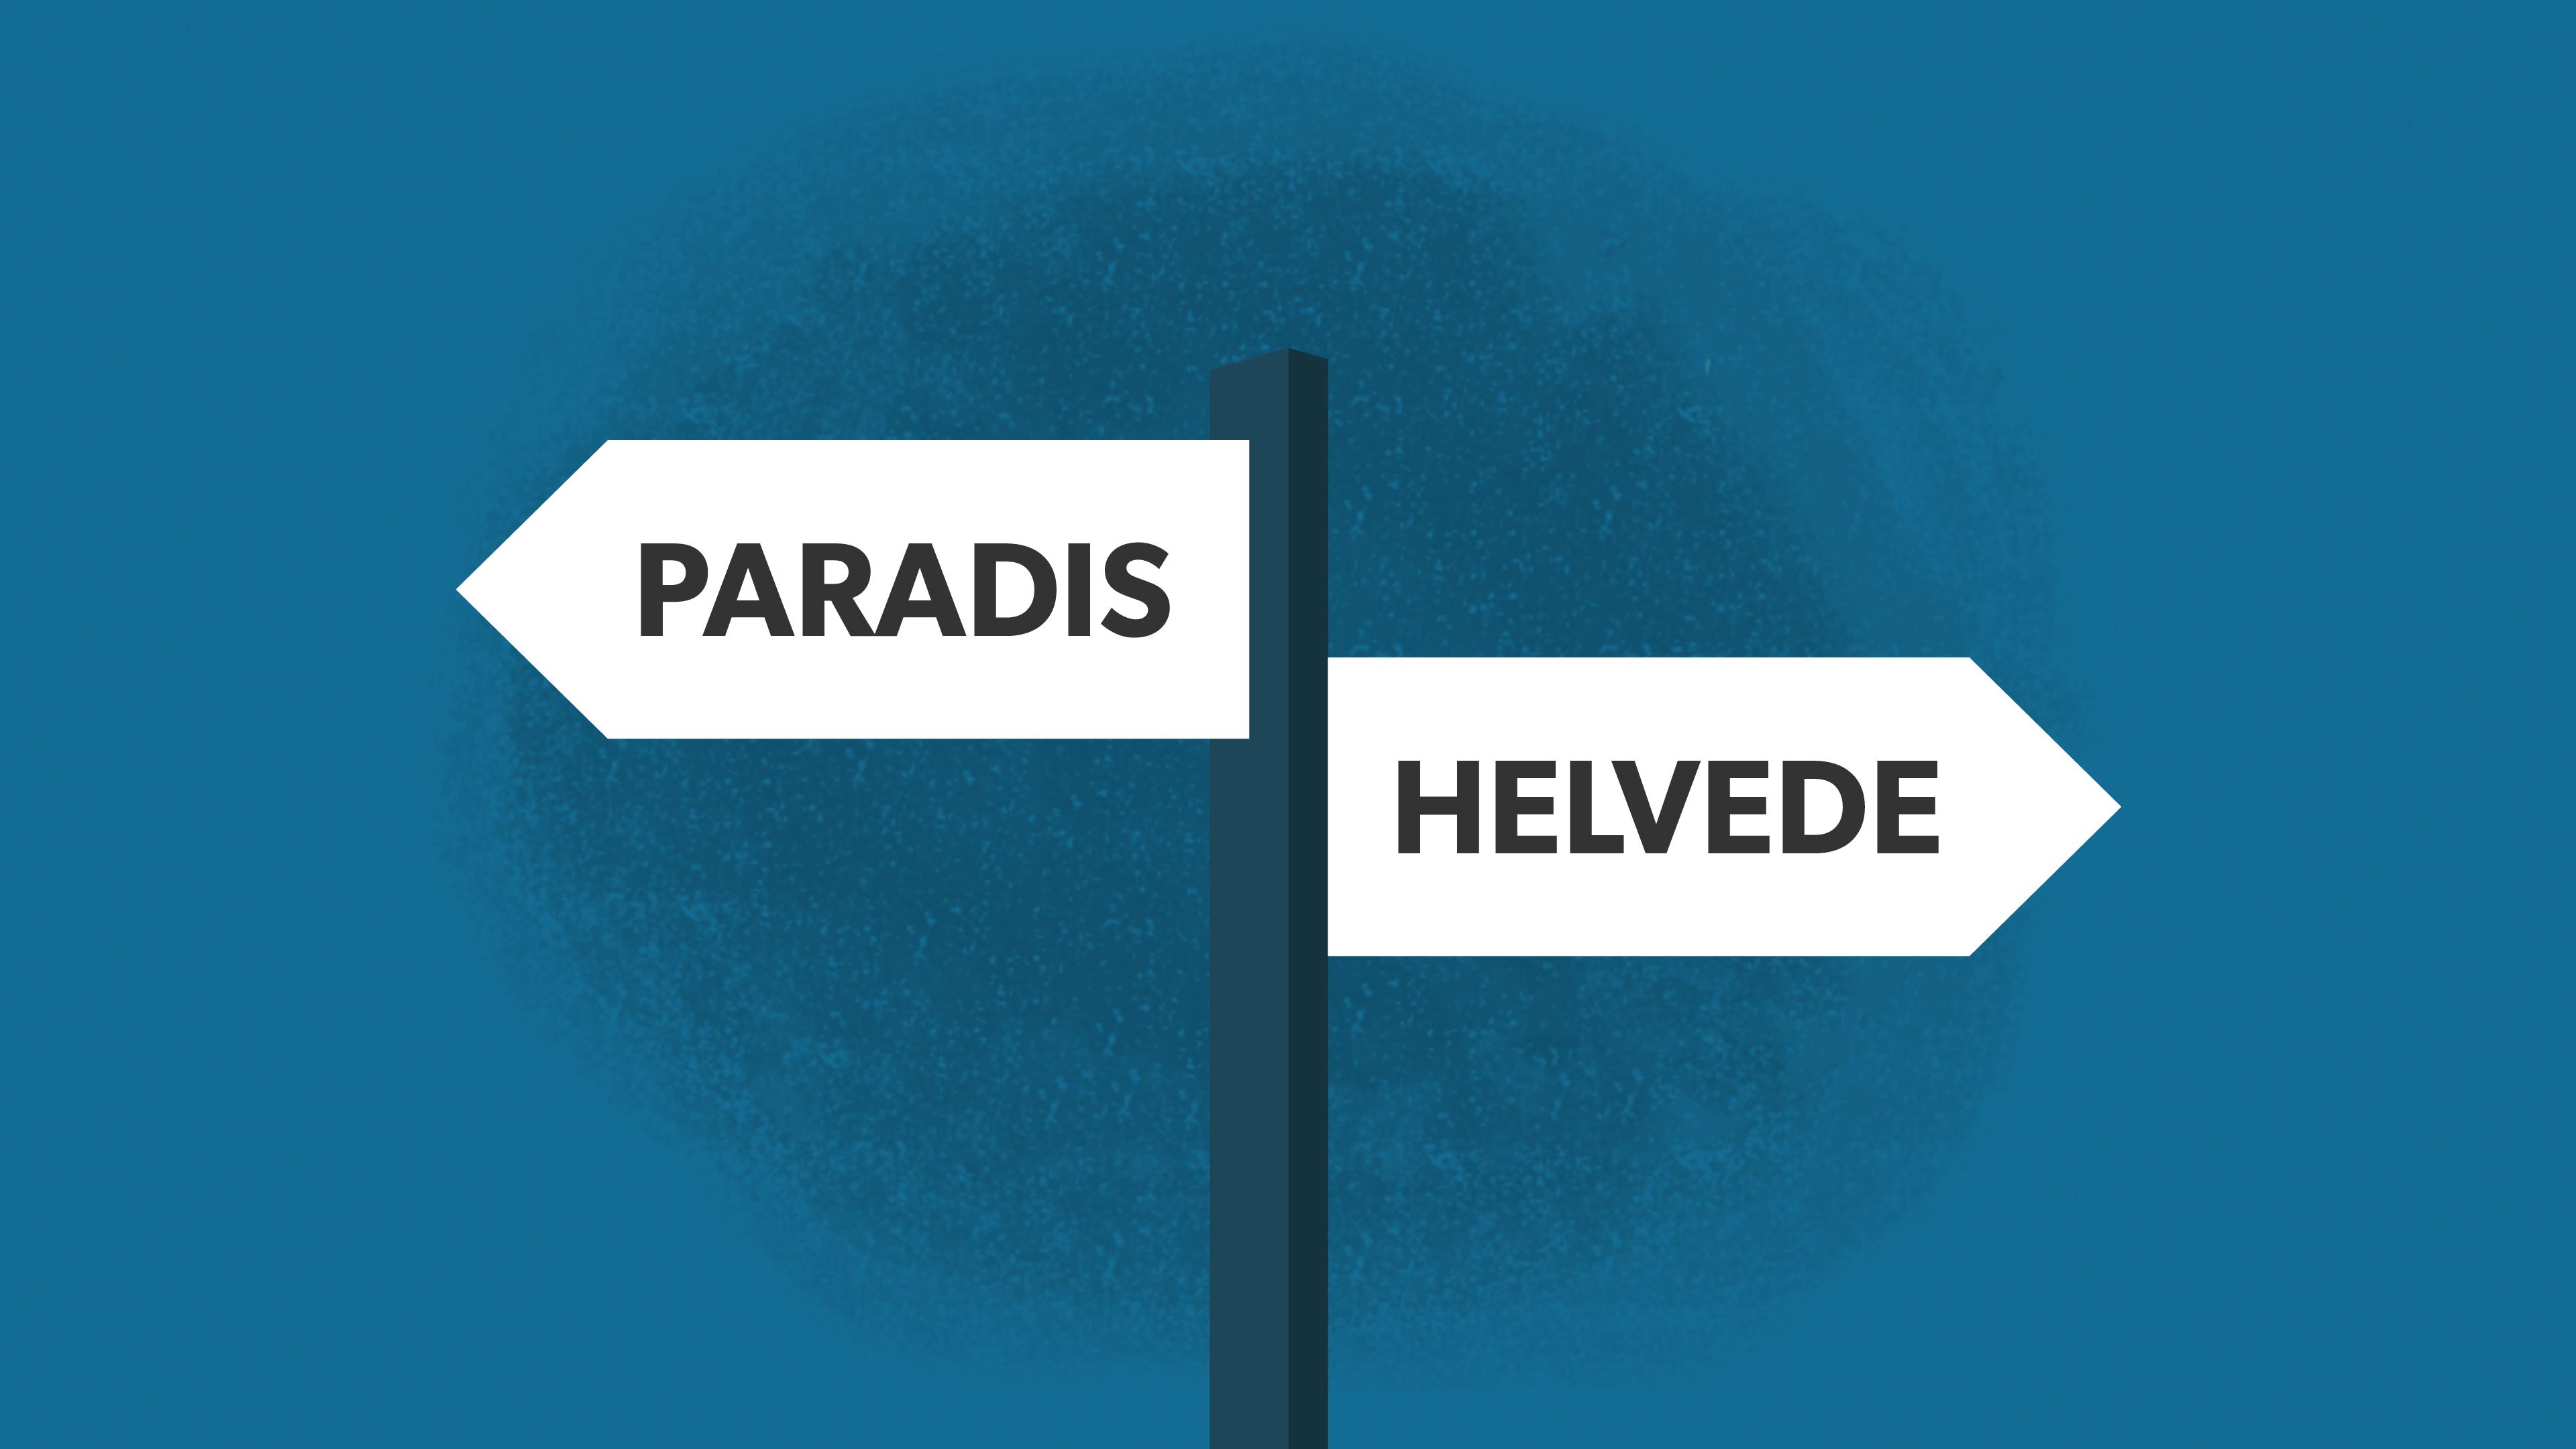 paradis_helvede_teaser.png